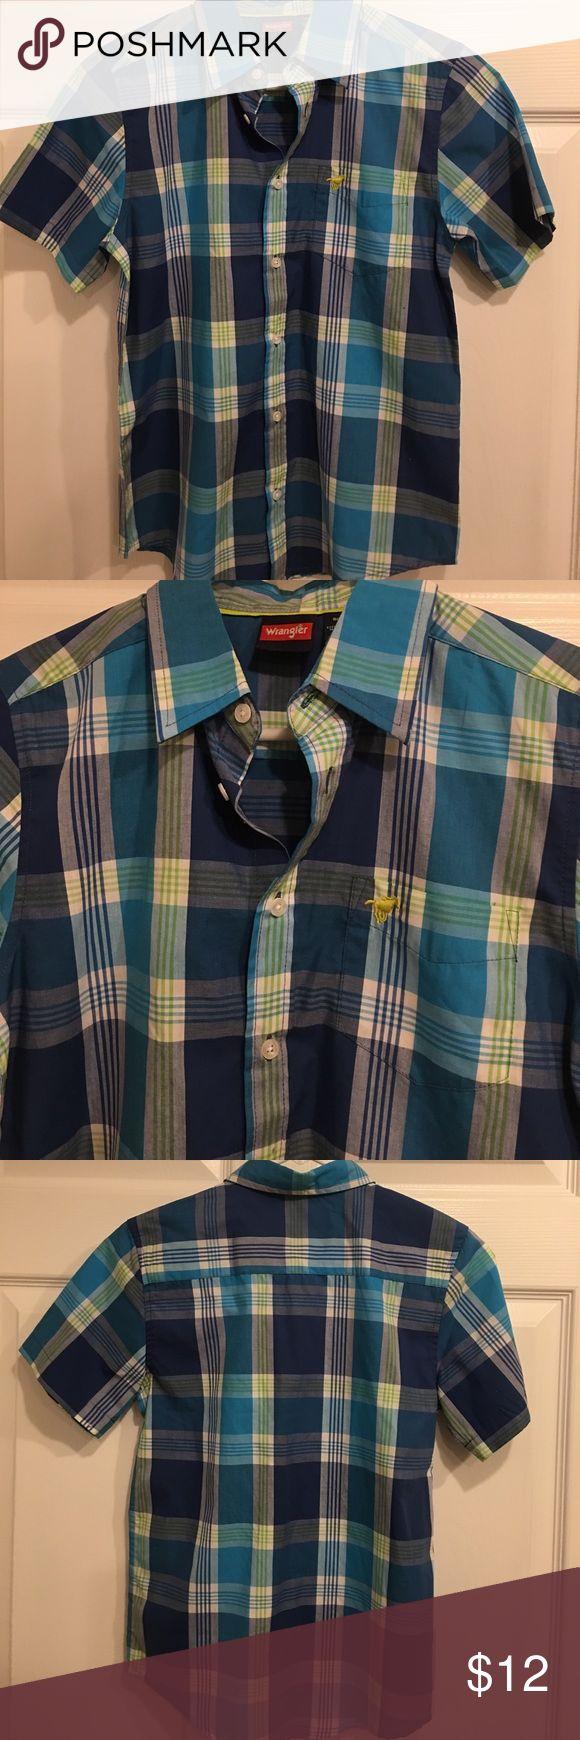 NWOT Boys Wrangler Shirt NWOT boys Wrangler shirt size L 10-12 Wrangler Shirts & Tops Button Down Shirts